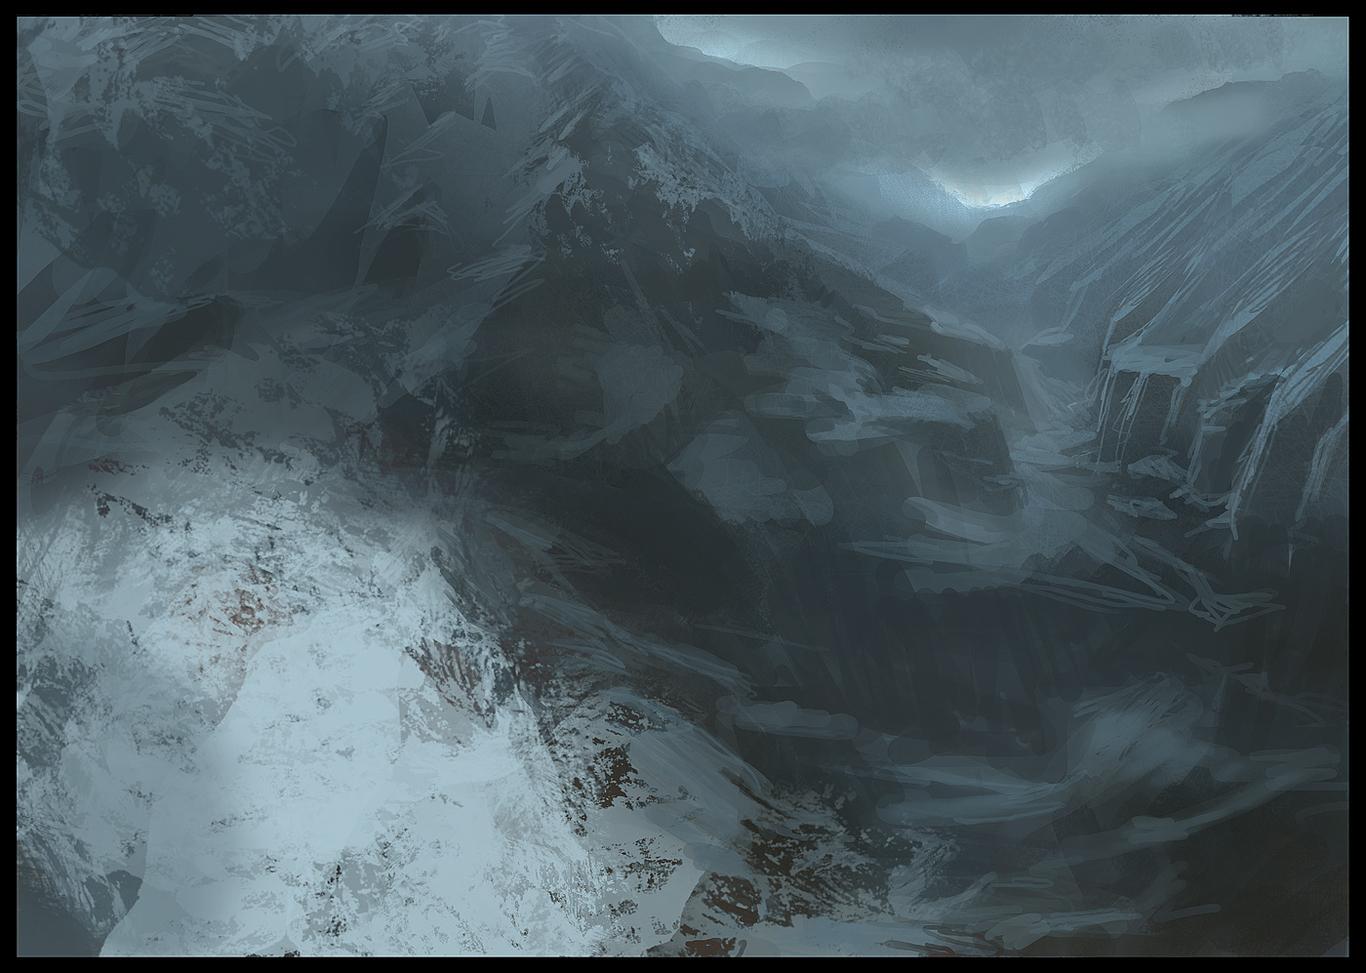 Paooo snow mountain 1 9bb64344 kwib